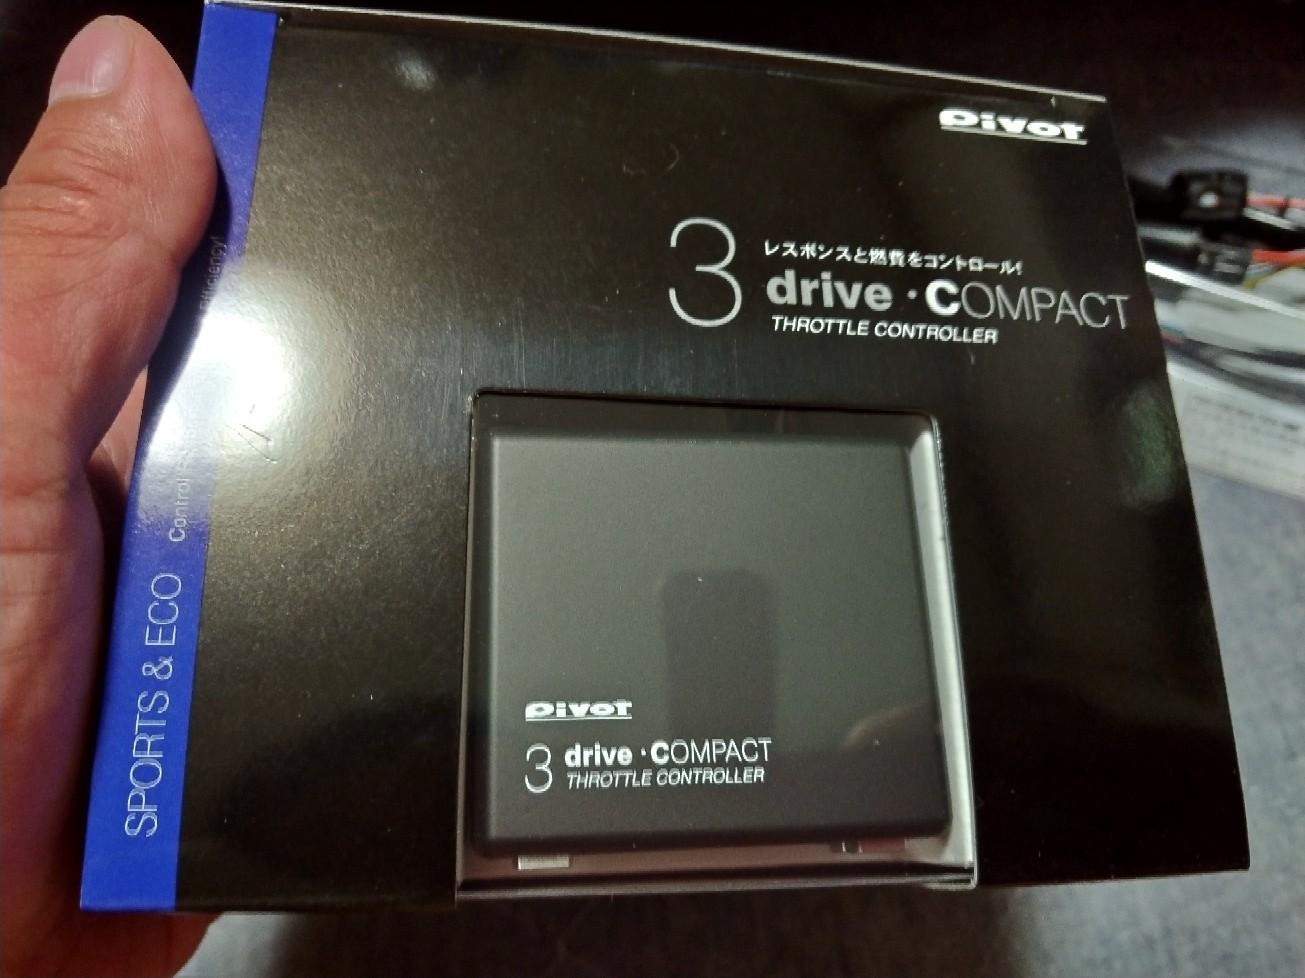 Pivot 3 Drive Compact Thc M Bm Vw Flat Throttle Controller